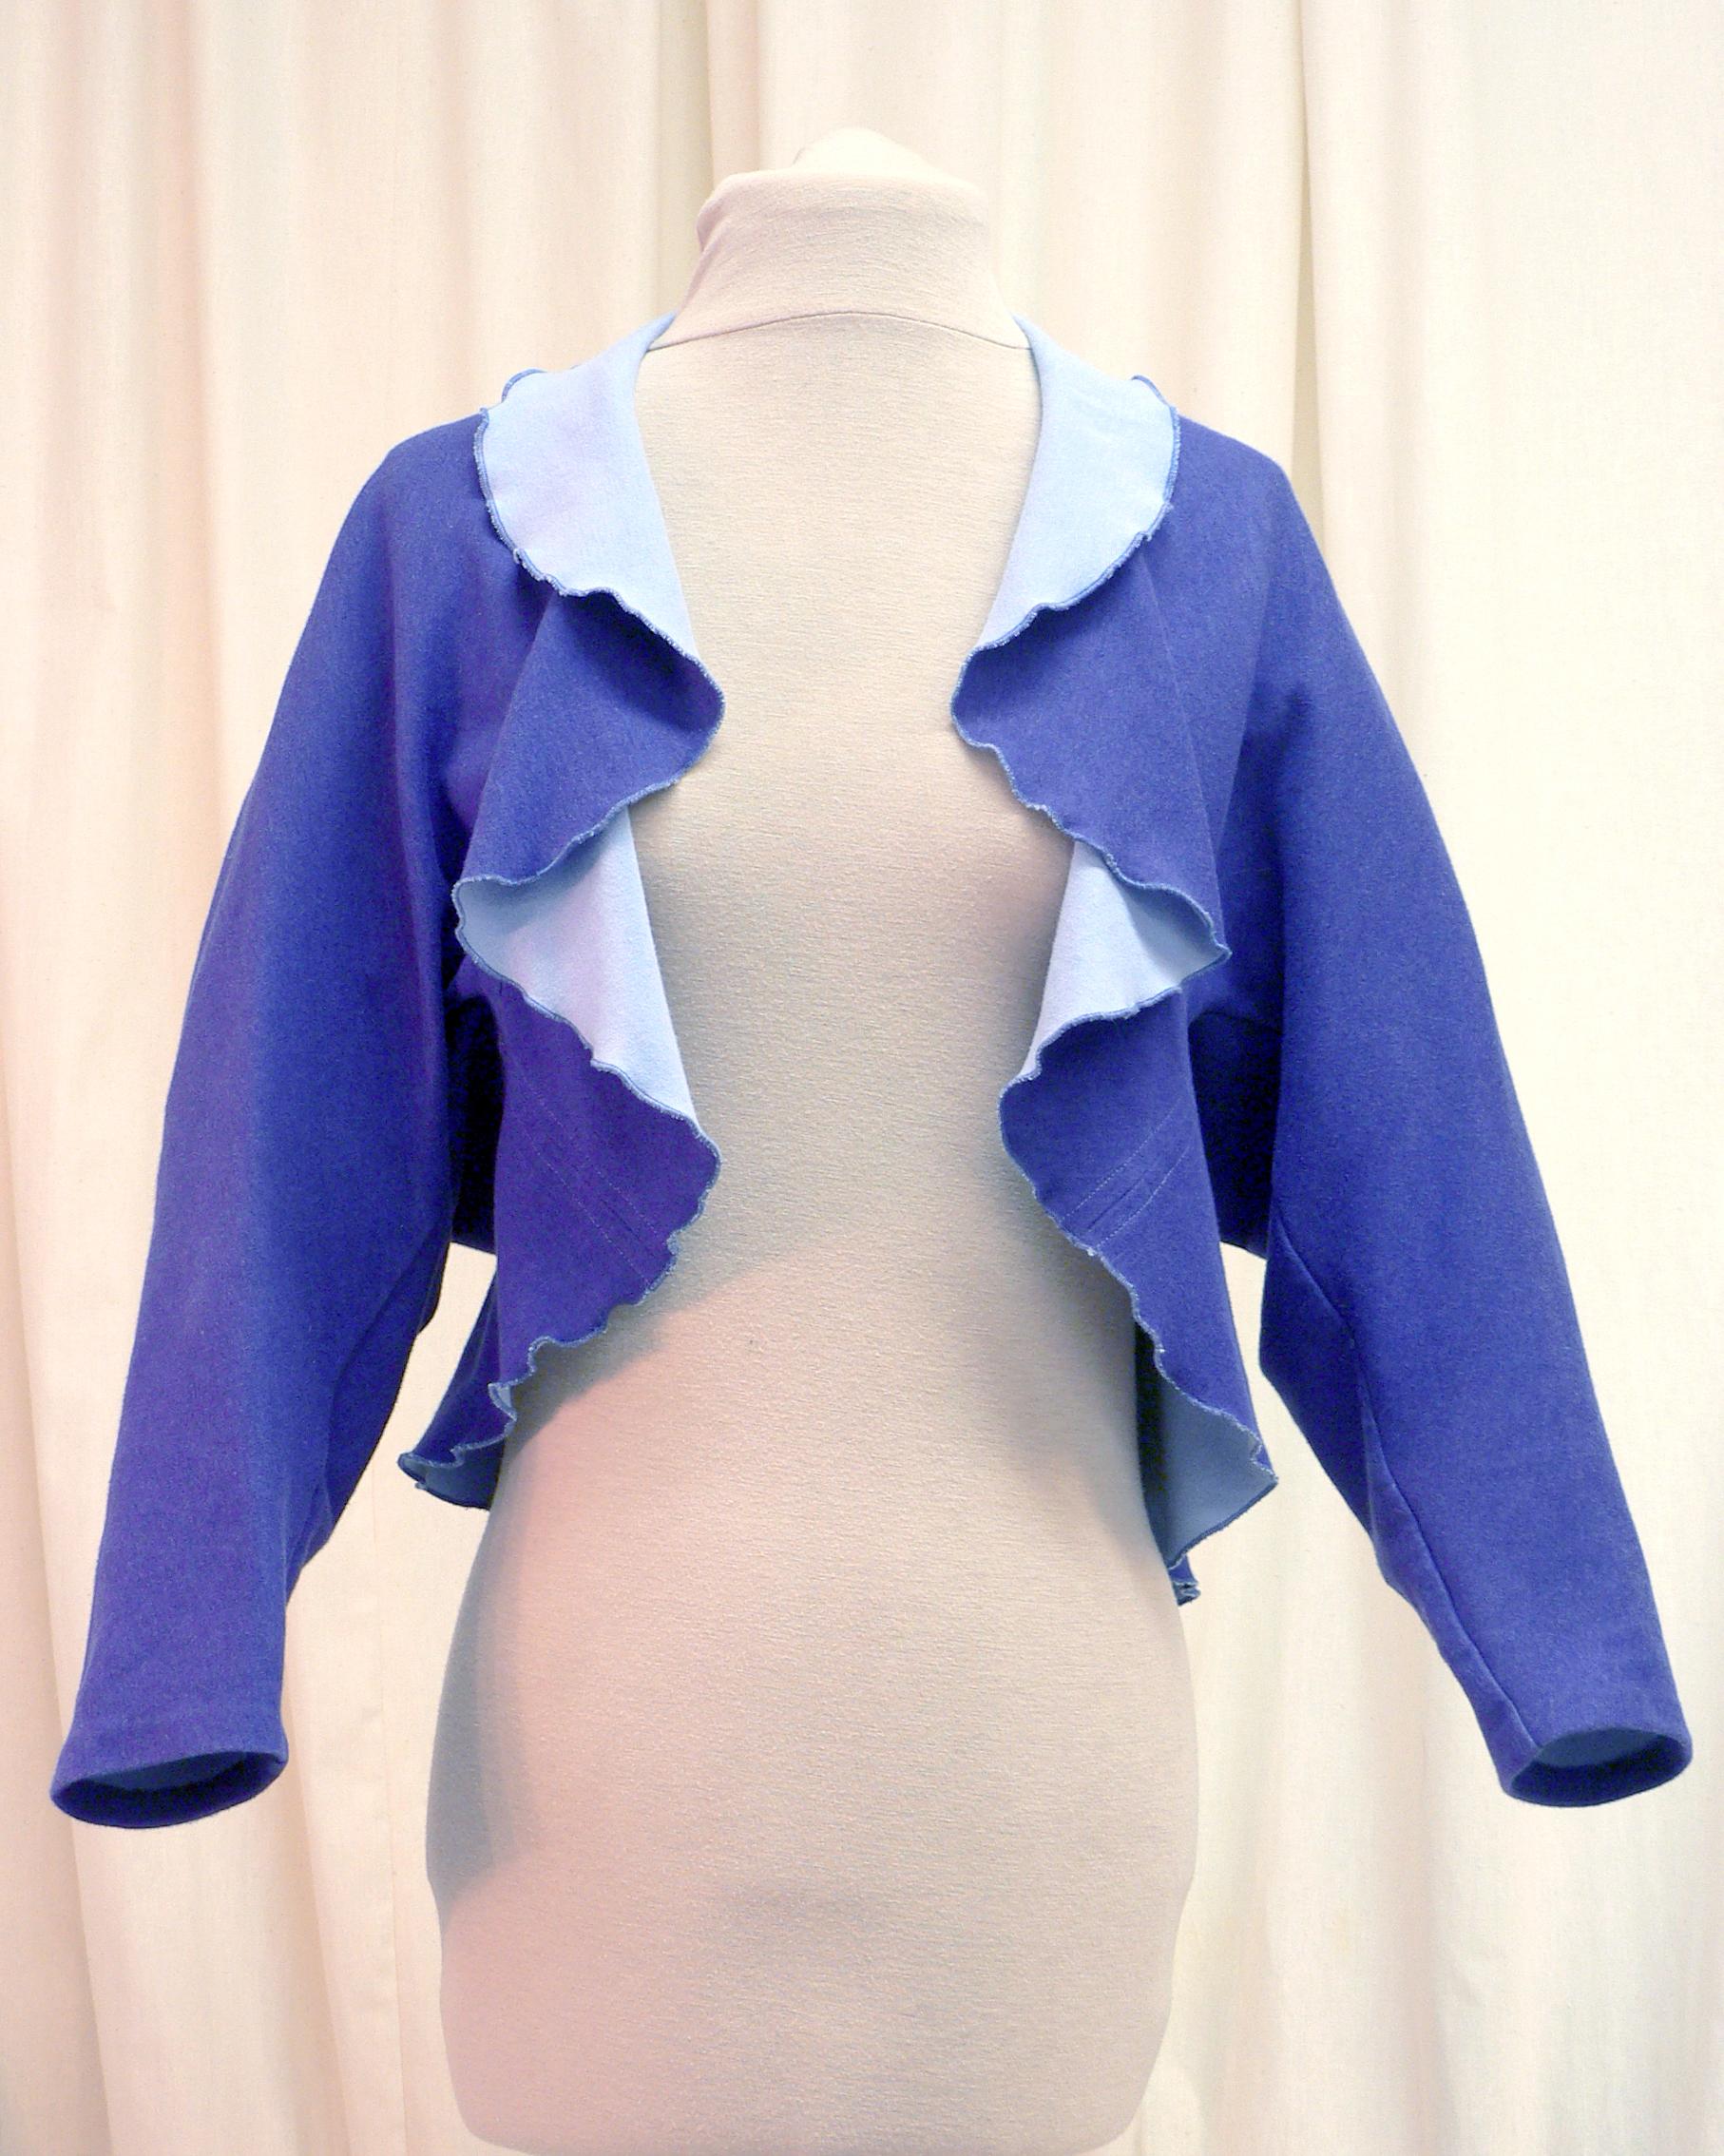 jacket22_front.jpg